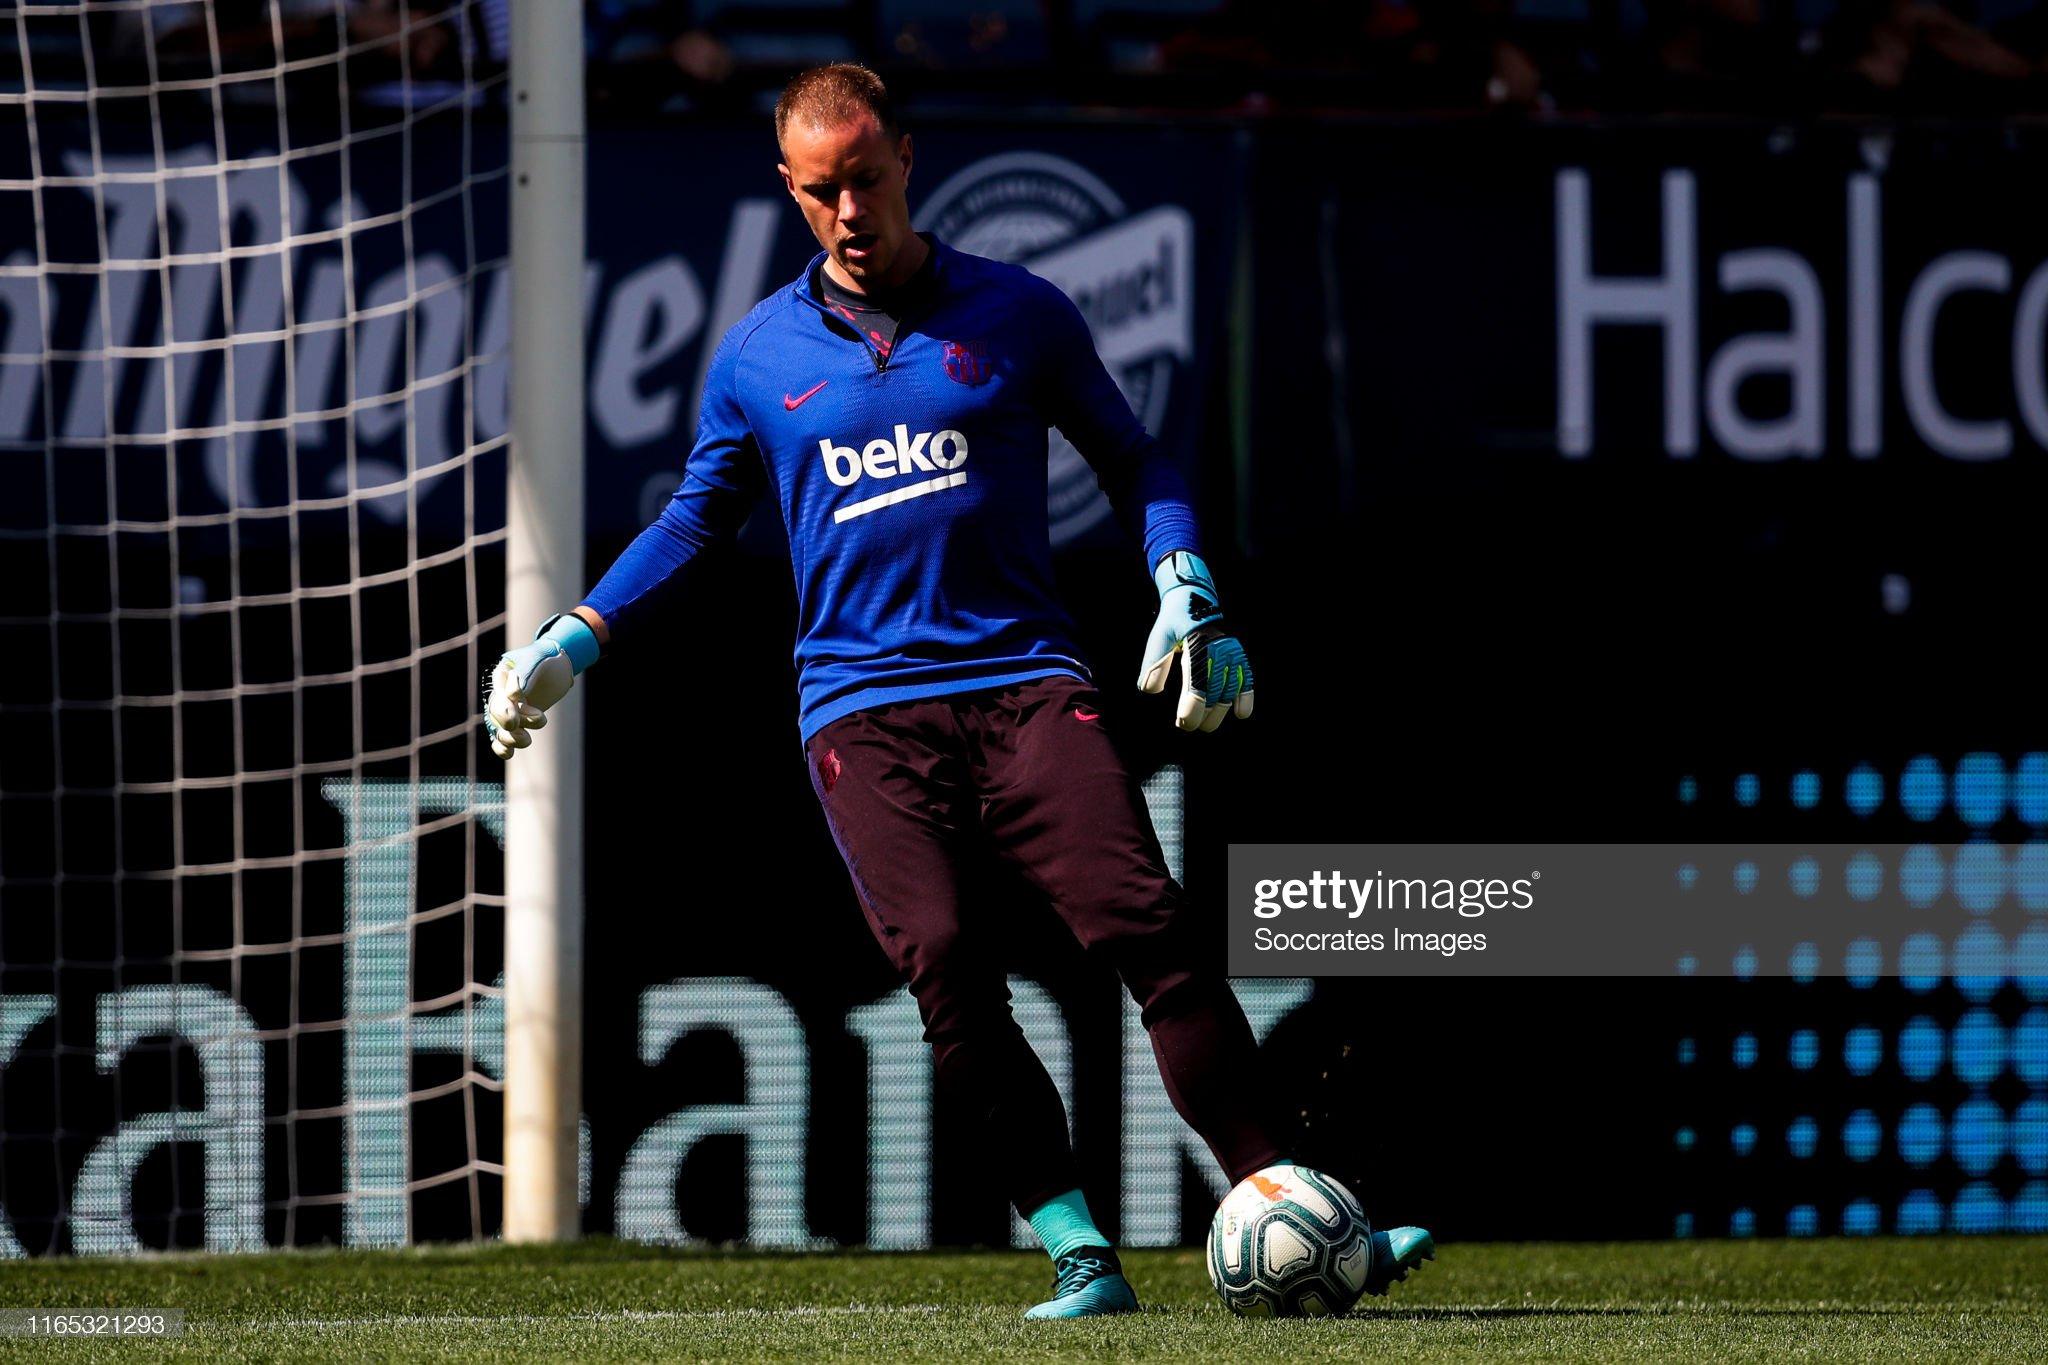 صور مباراة : أوساسونا - برشلونة 2-2 ( 31-08-2019 )  Marc-andre-ter-stegen-of-fc-barcelona-during-the-la-liga-santander-picture-id1165321293?s=2048x2048